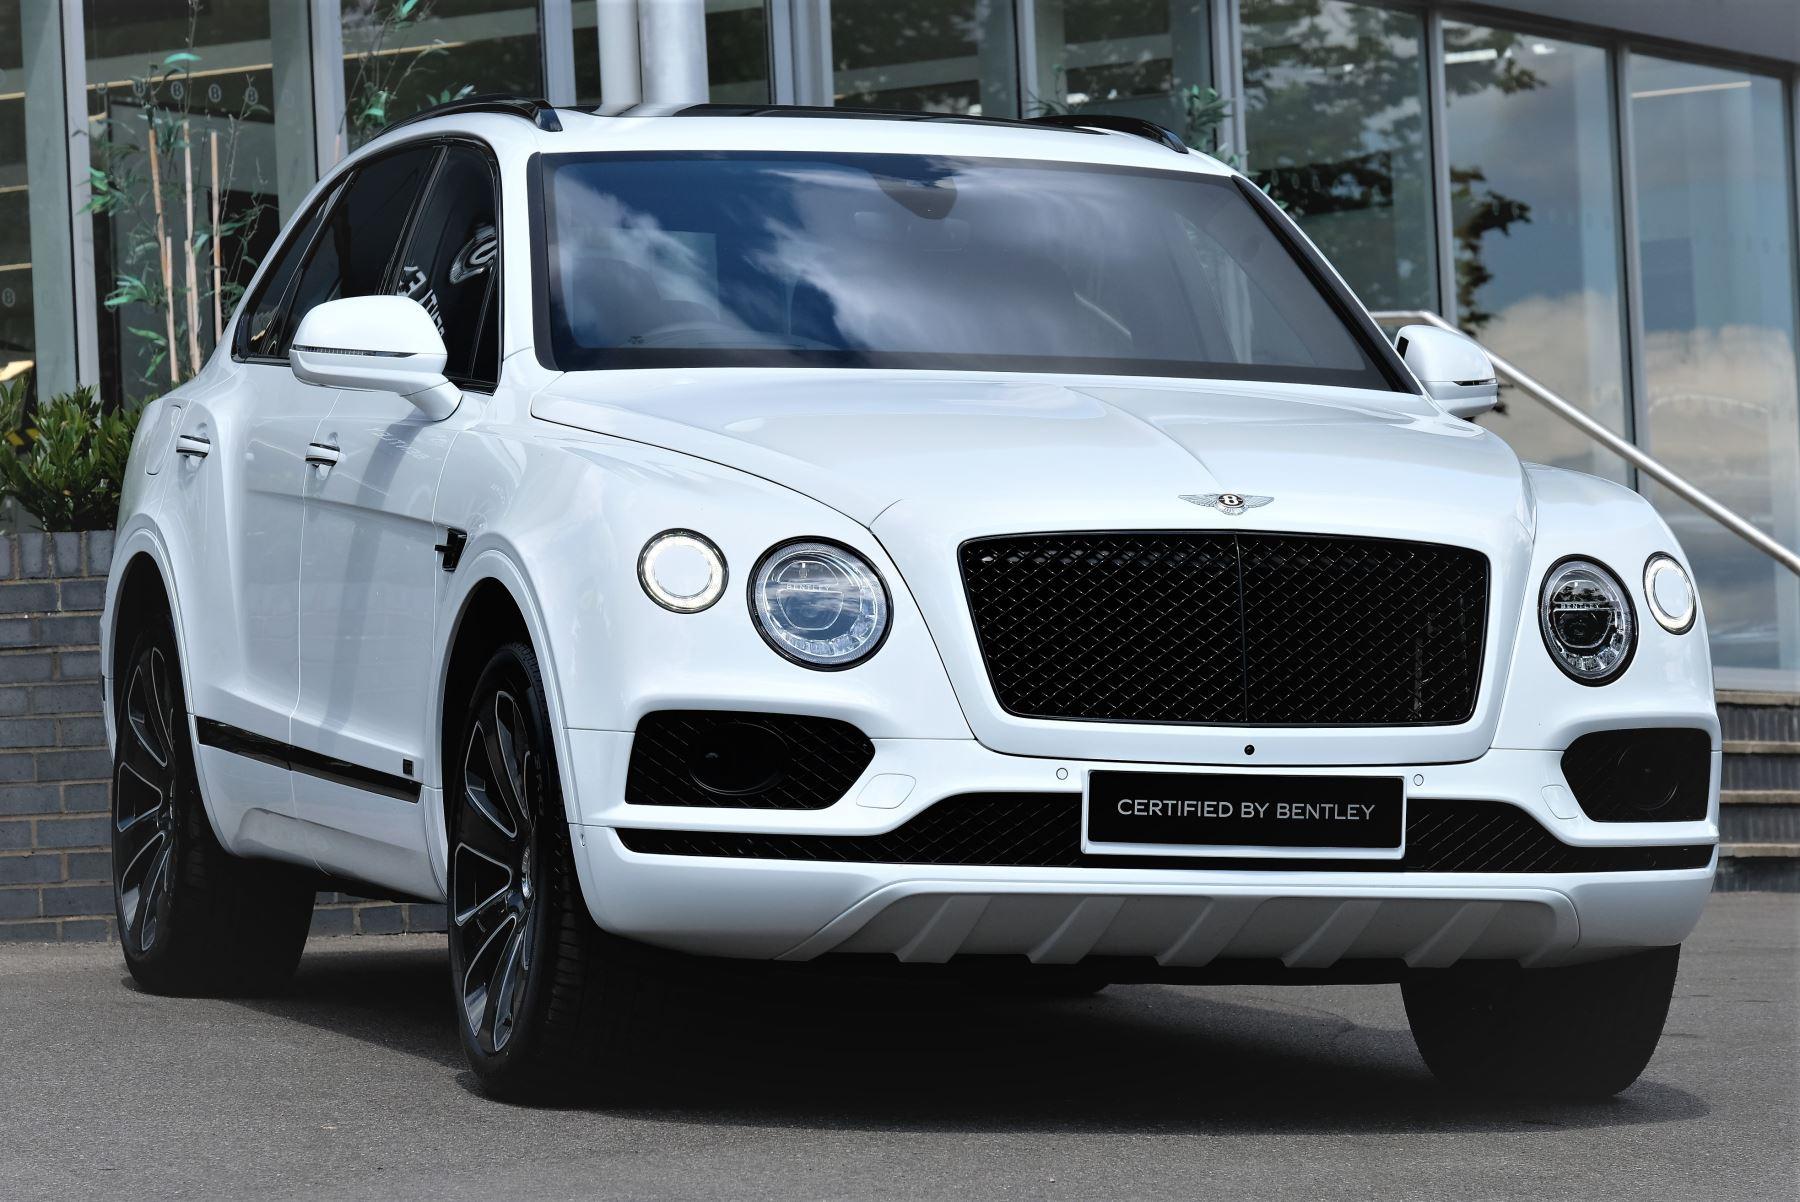 Bentley Bentayga V8 4.0 Design Series 5dr image 1